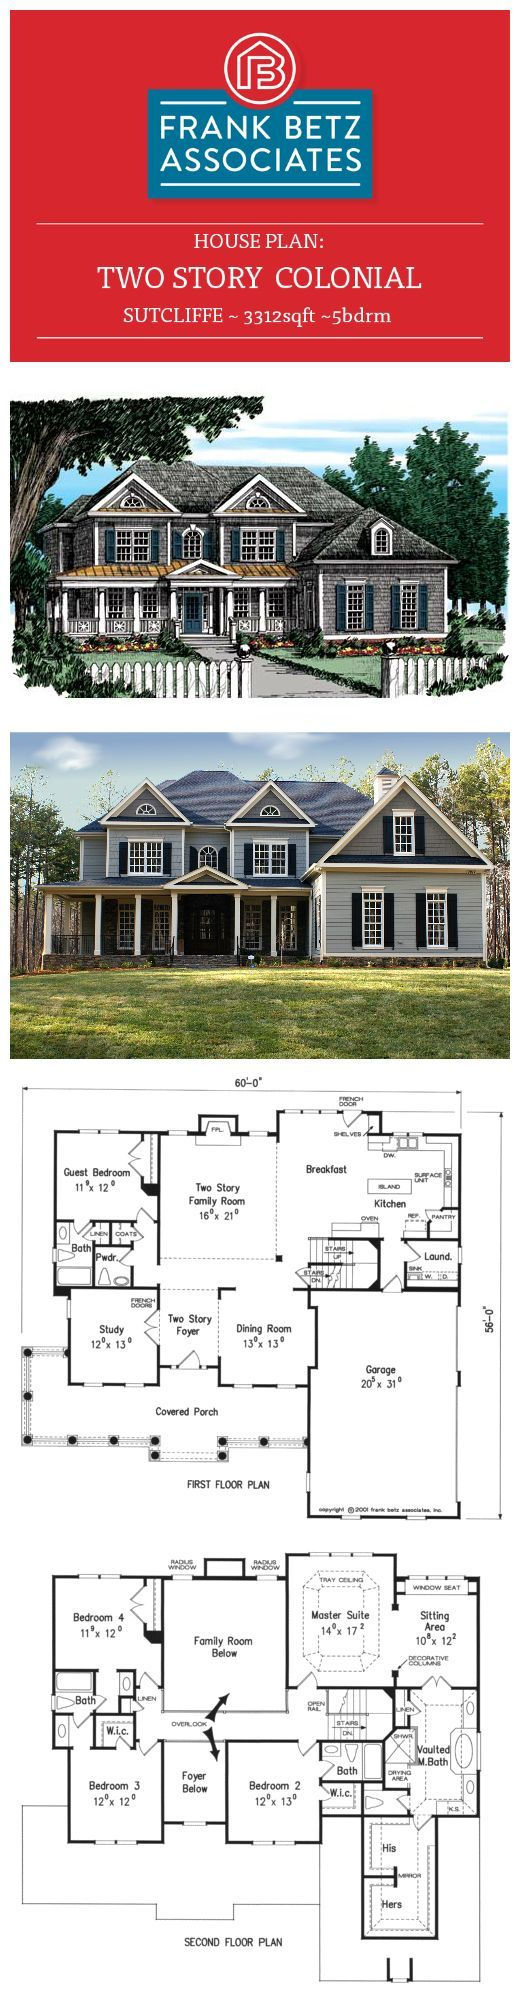 Sutcliffe: 3312sqft|5bdrm two-story Colonial house plan by Frank Betz Associates Inc.